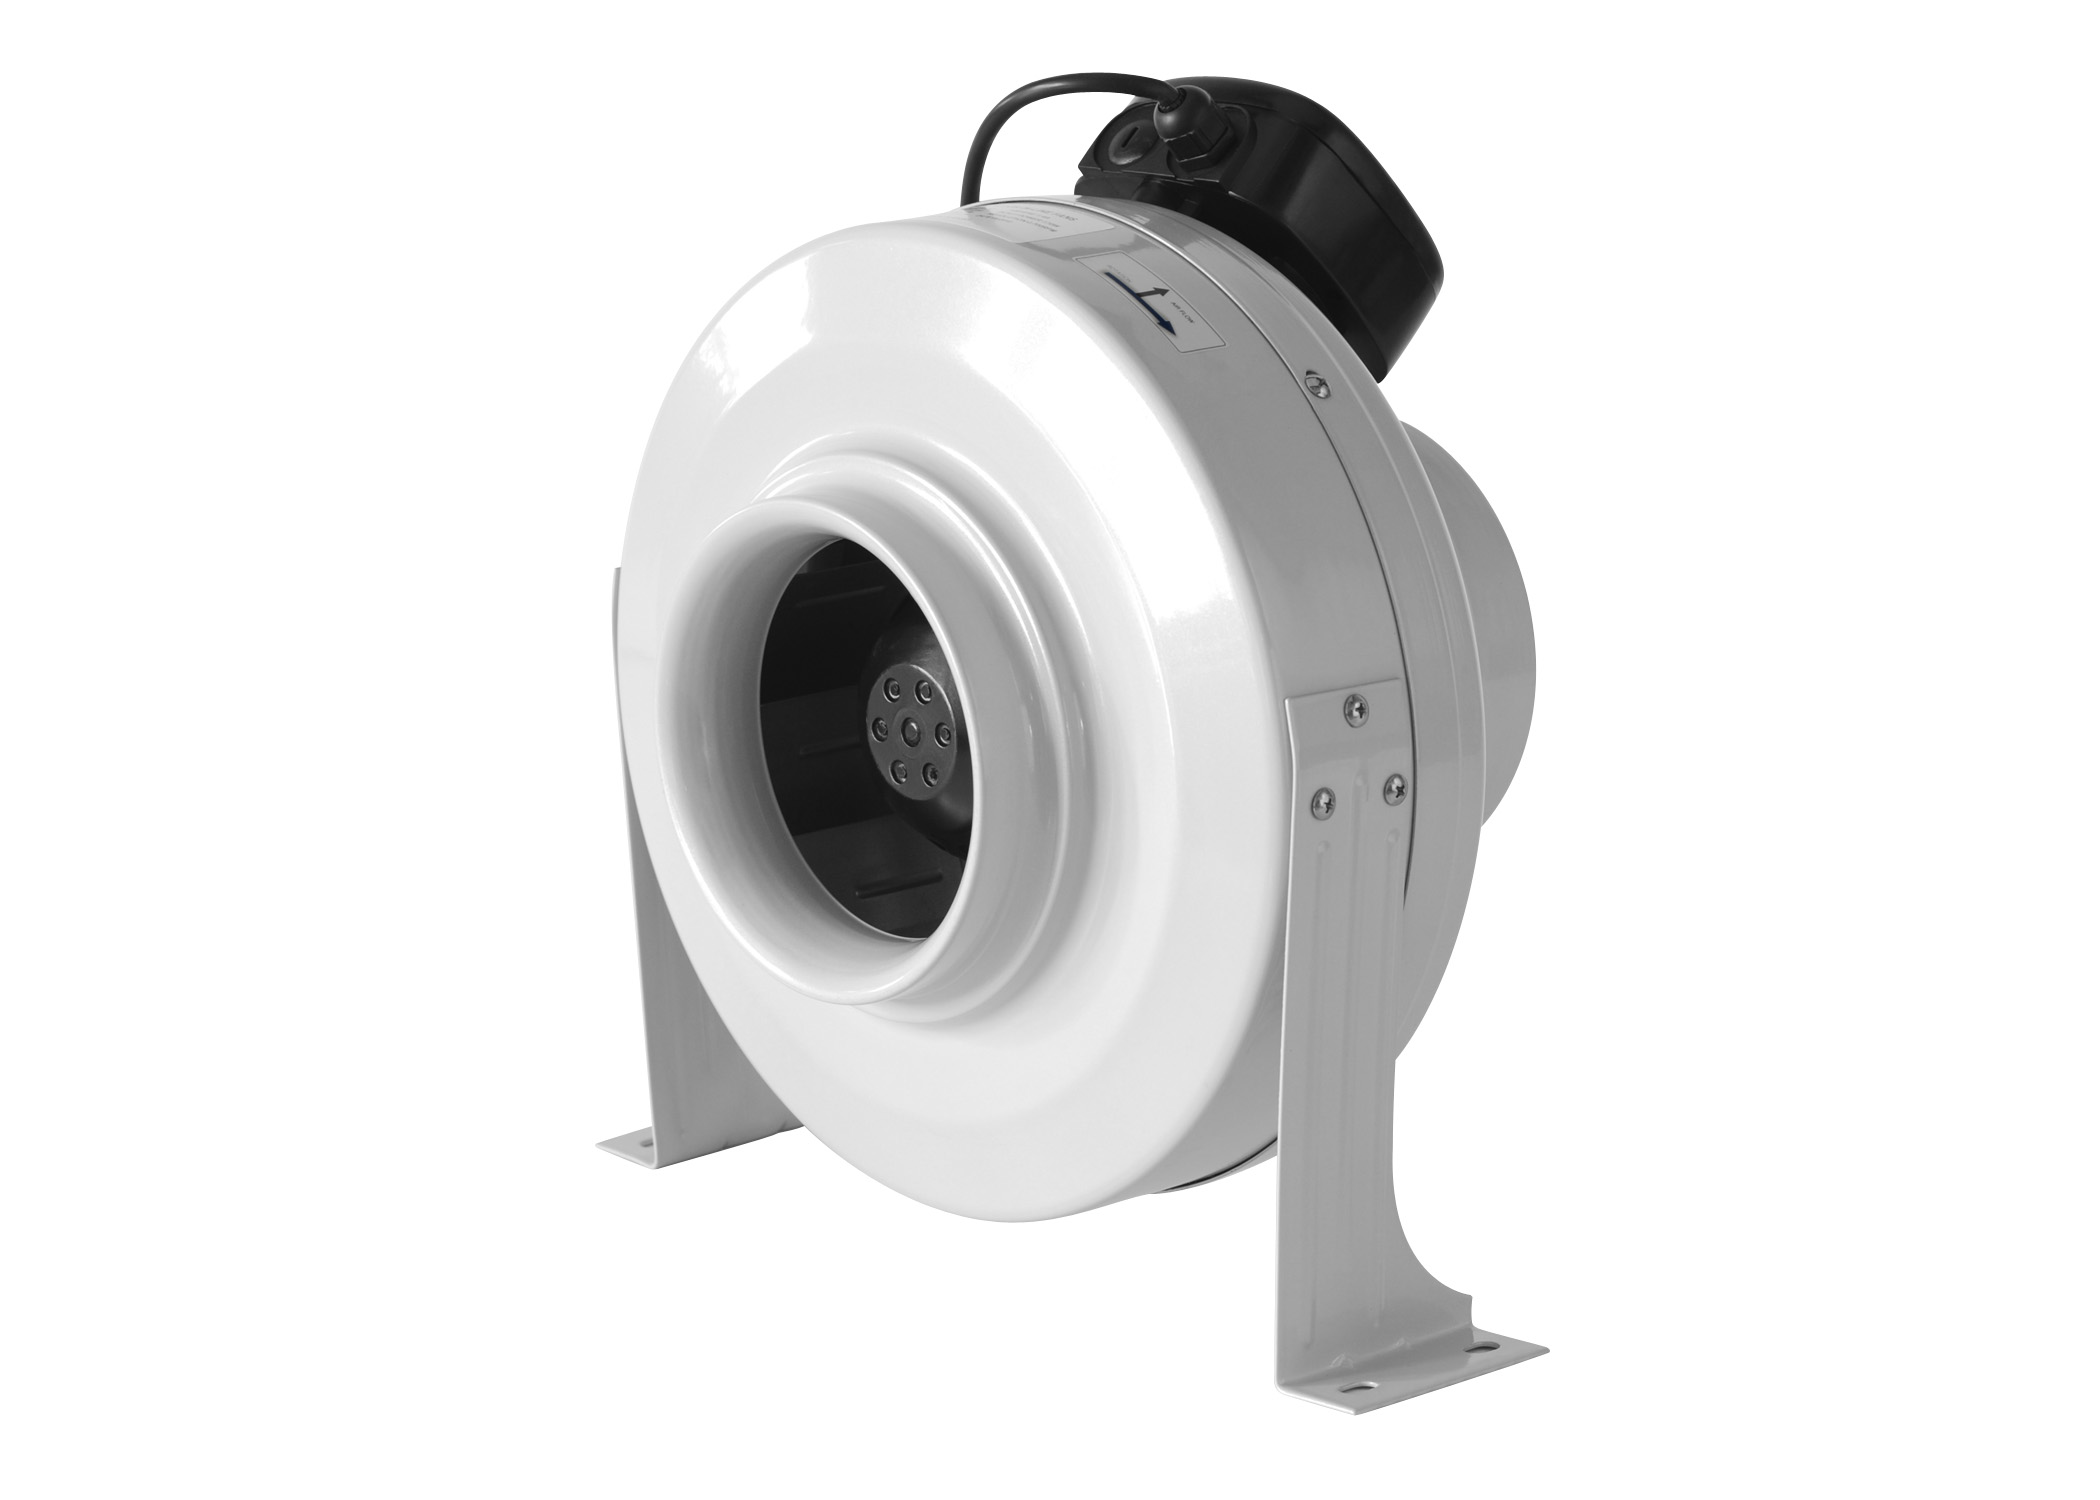 3 Inch Inline Fan : Quot inline duct fan blower hydroponic air vent exhaust